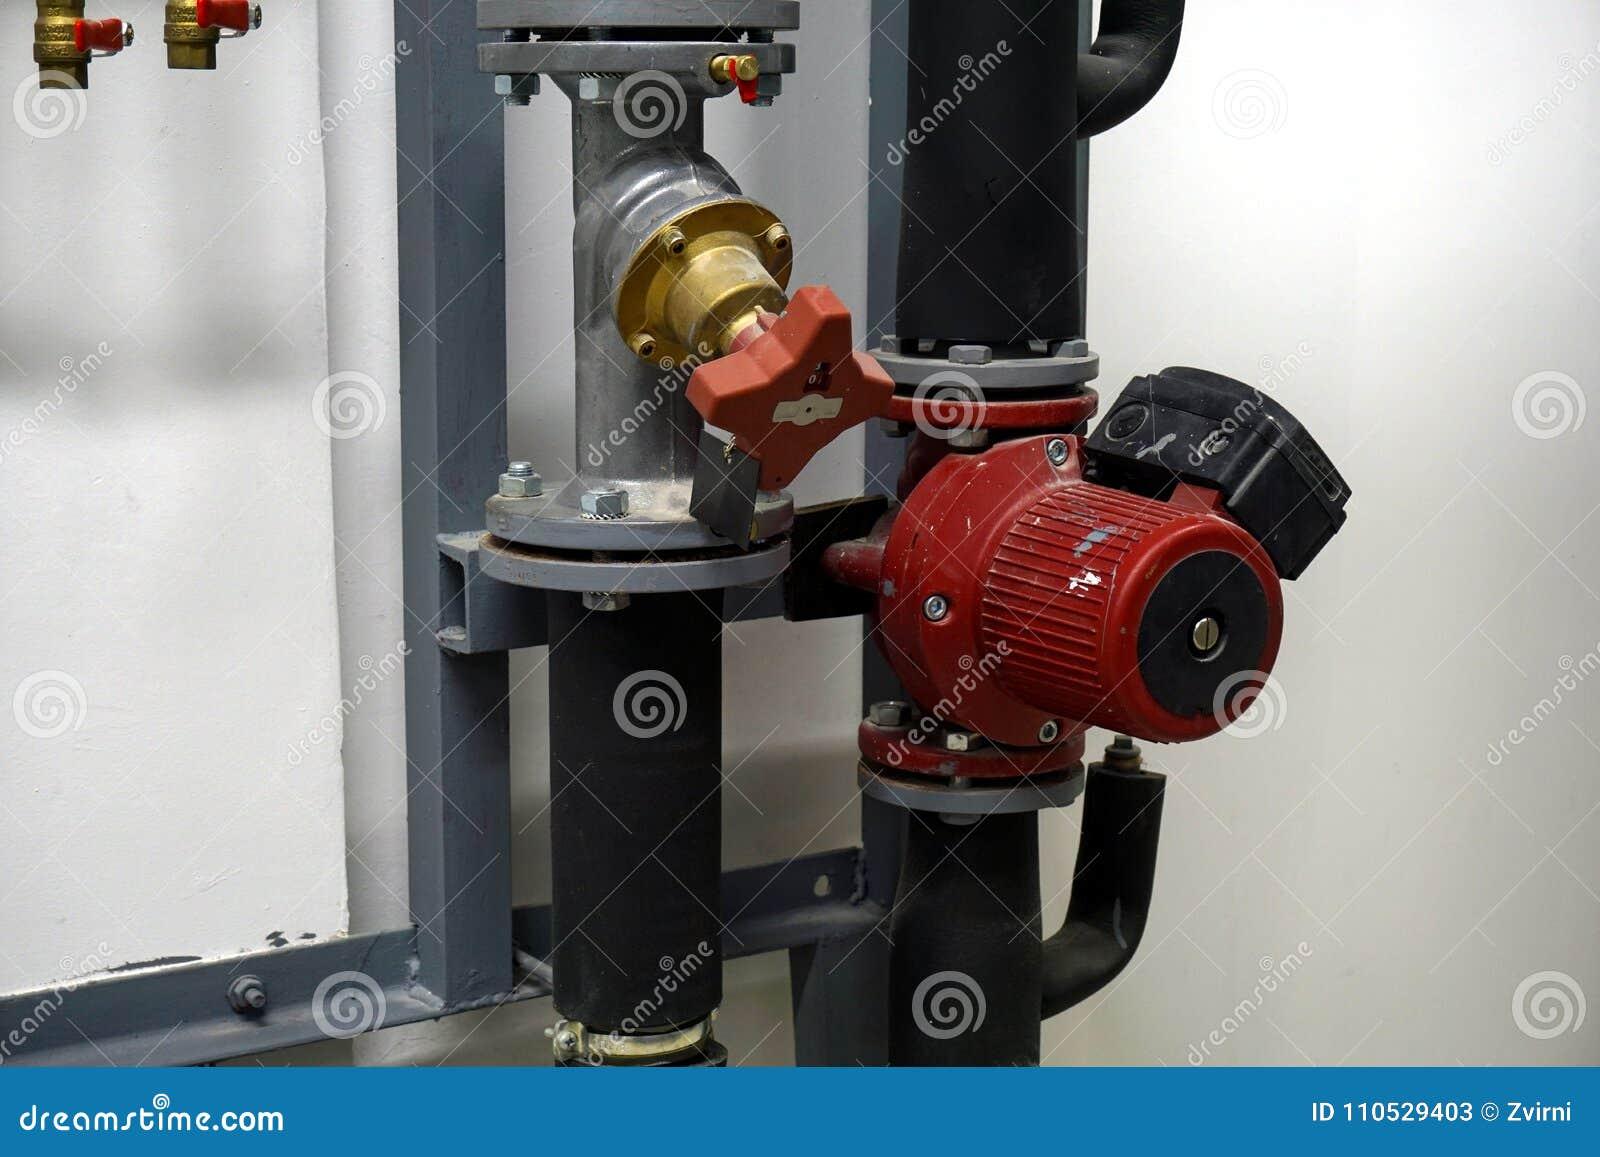 Red Circulation Pump and a balancing valve